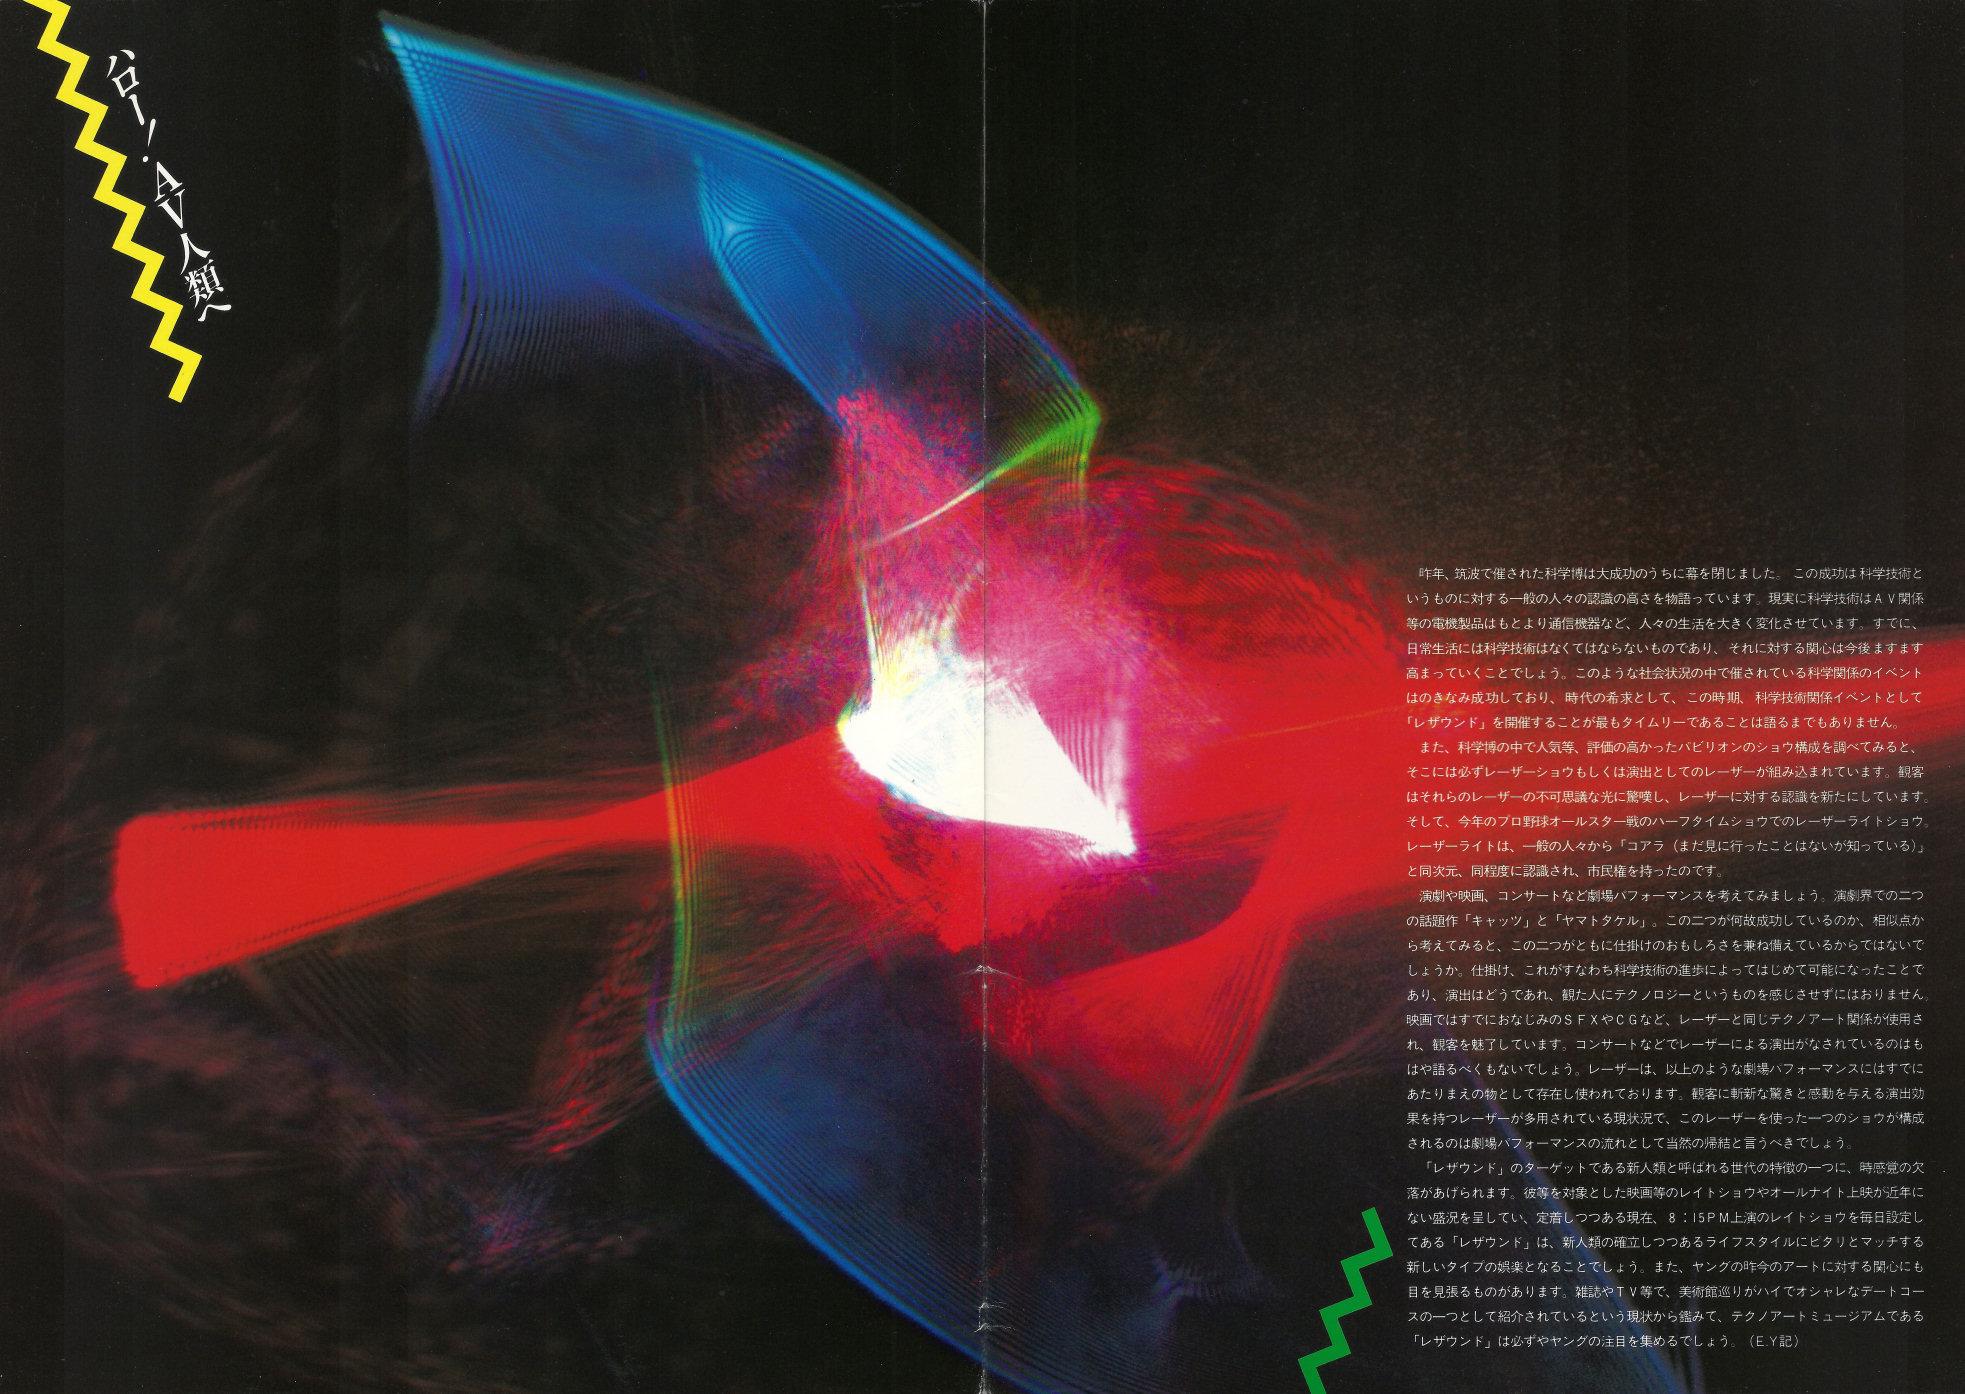 http://tokyosky.to/tokyosky_webmasters_blog/2014/04/12/blogimage/Sunshine_Lassound_program1.jpg